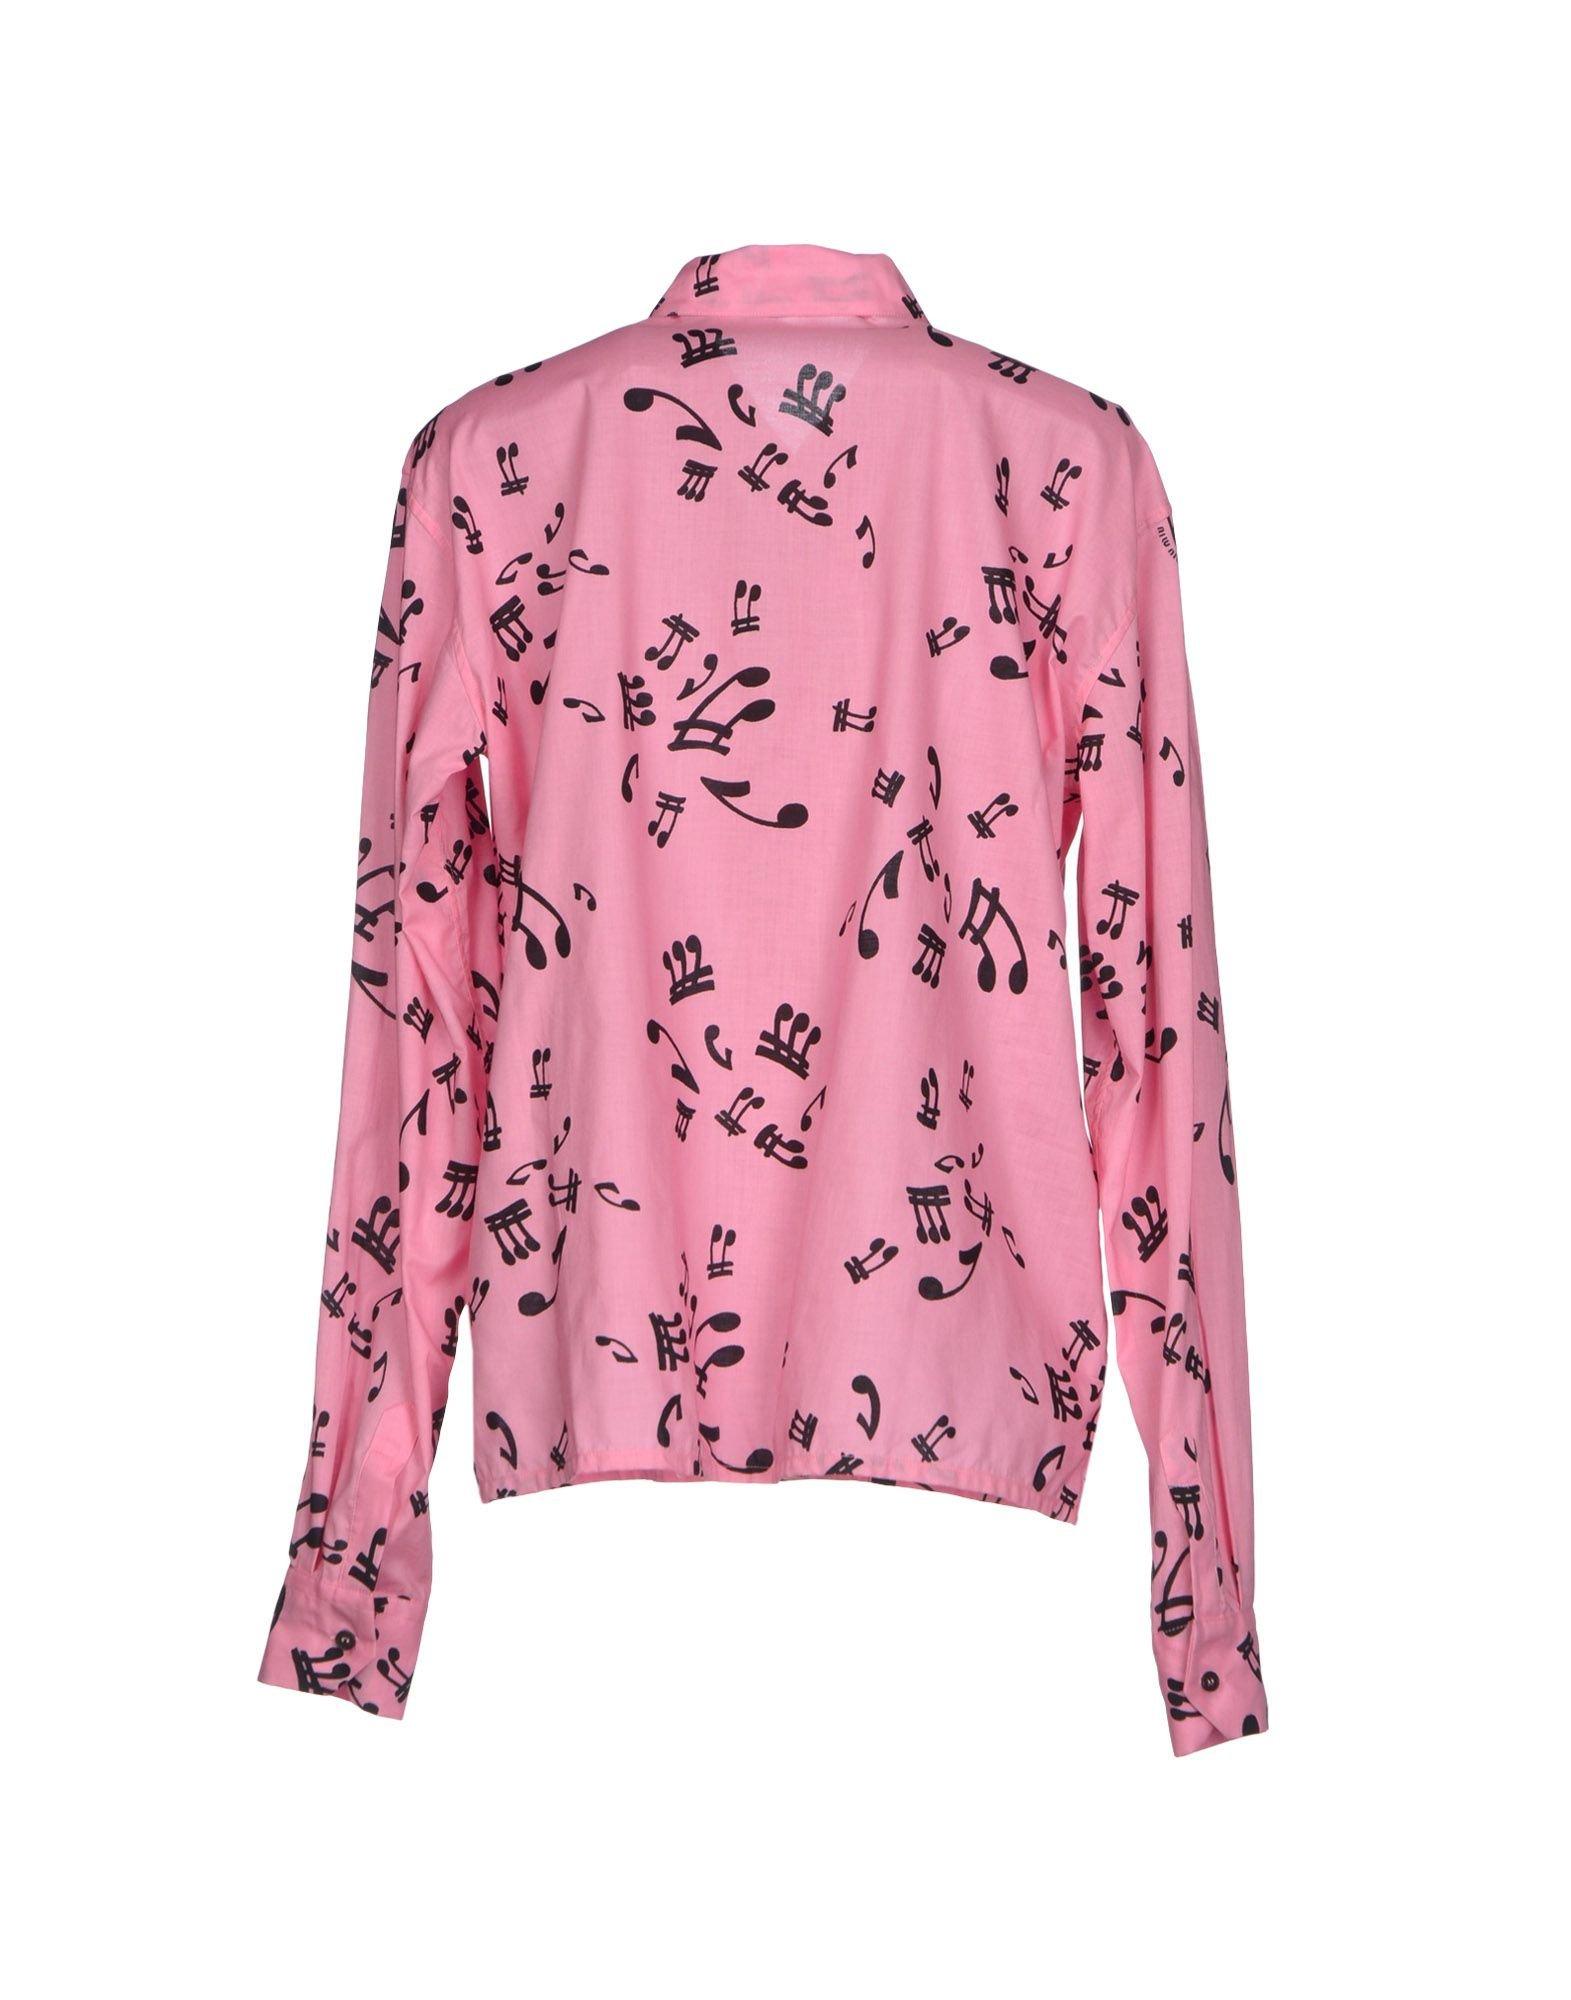 Miu miu shirt in pink lyst for Miu miu t shirt